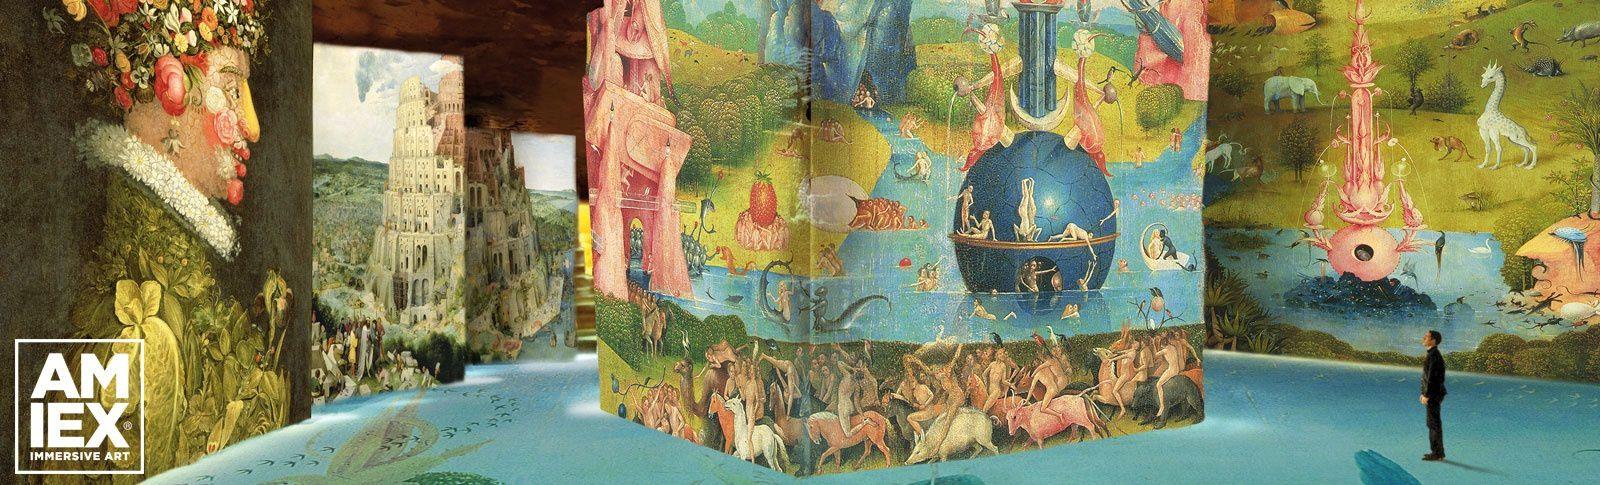 Exposition immersive:  Bosch, Brueghel, Arcimboldo - Fantastique et merveilleux